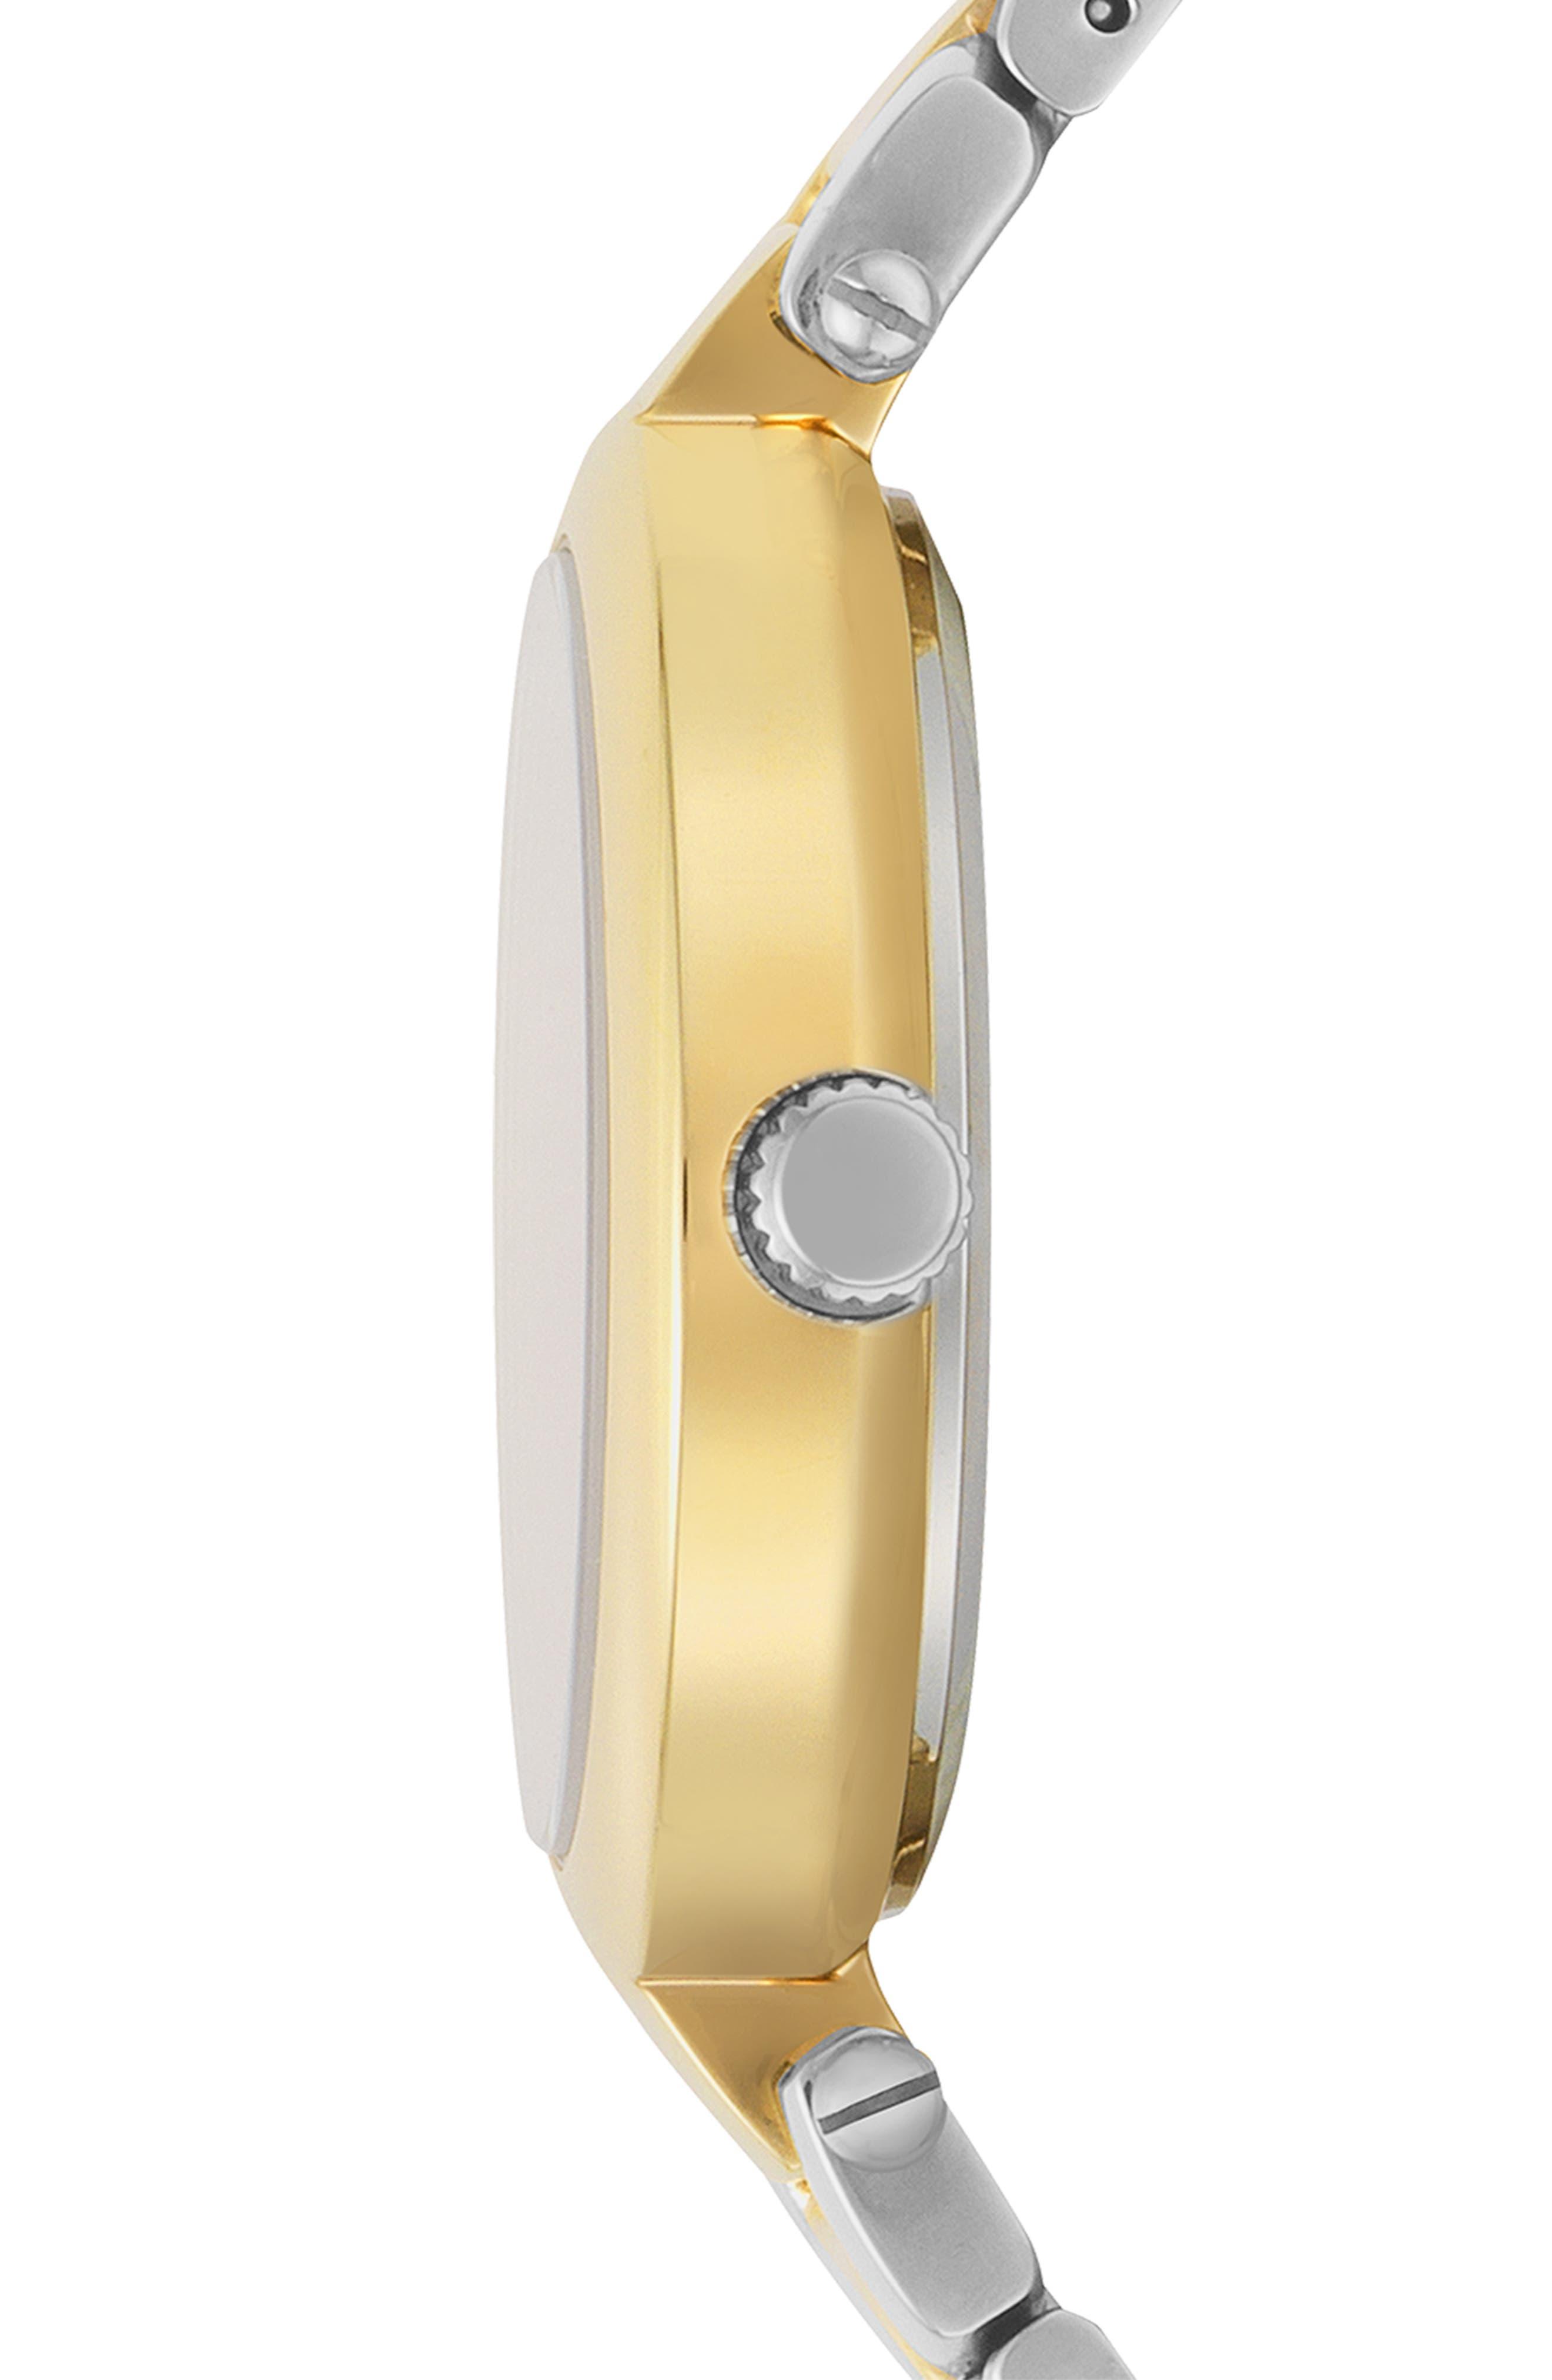 VERSUS VERSACE, Buffle Bay Bracelet Watch, 36mm, Alternate thumbnail 2, color, SILVER/ GOLD